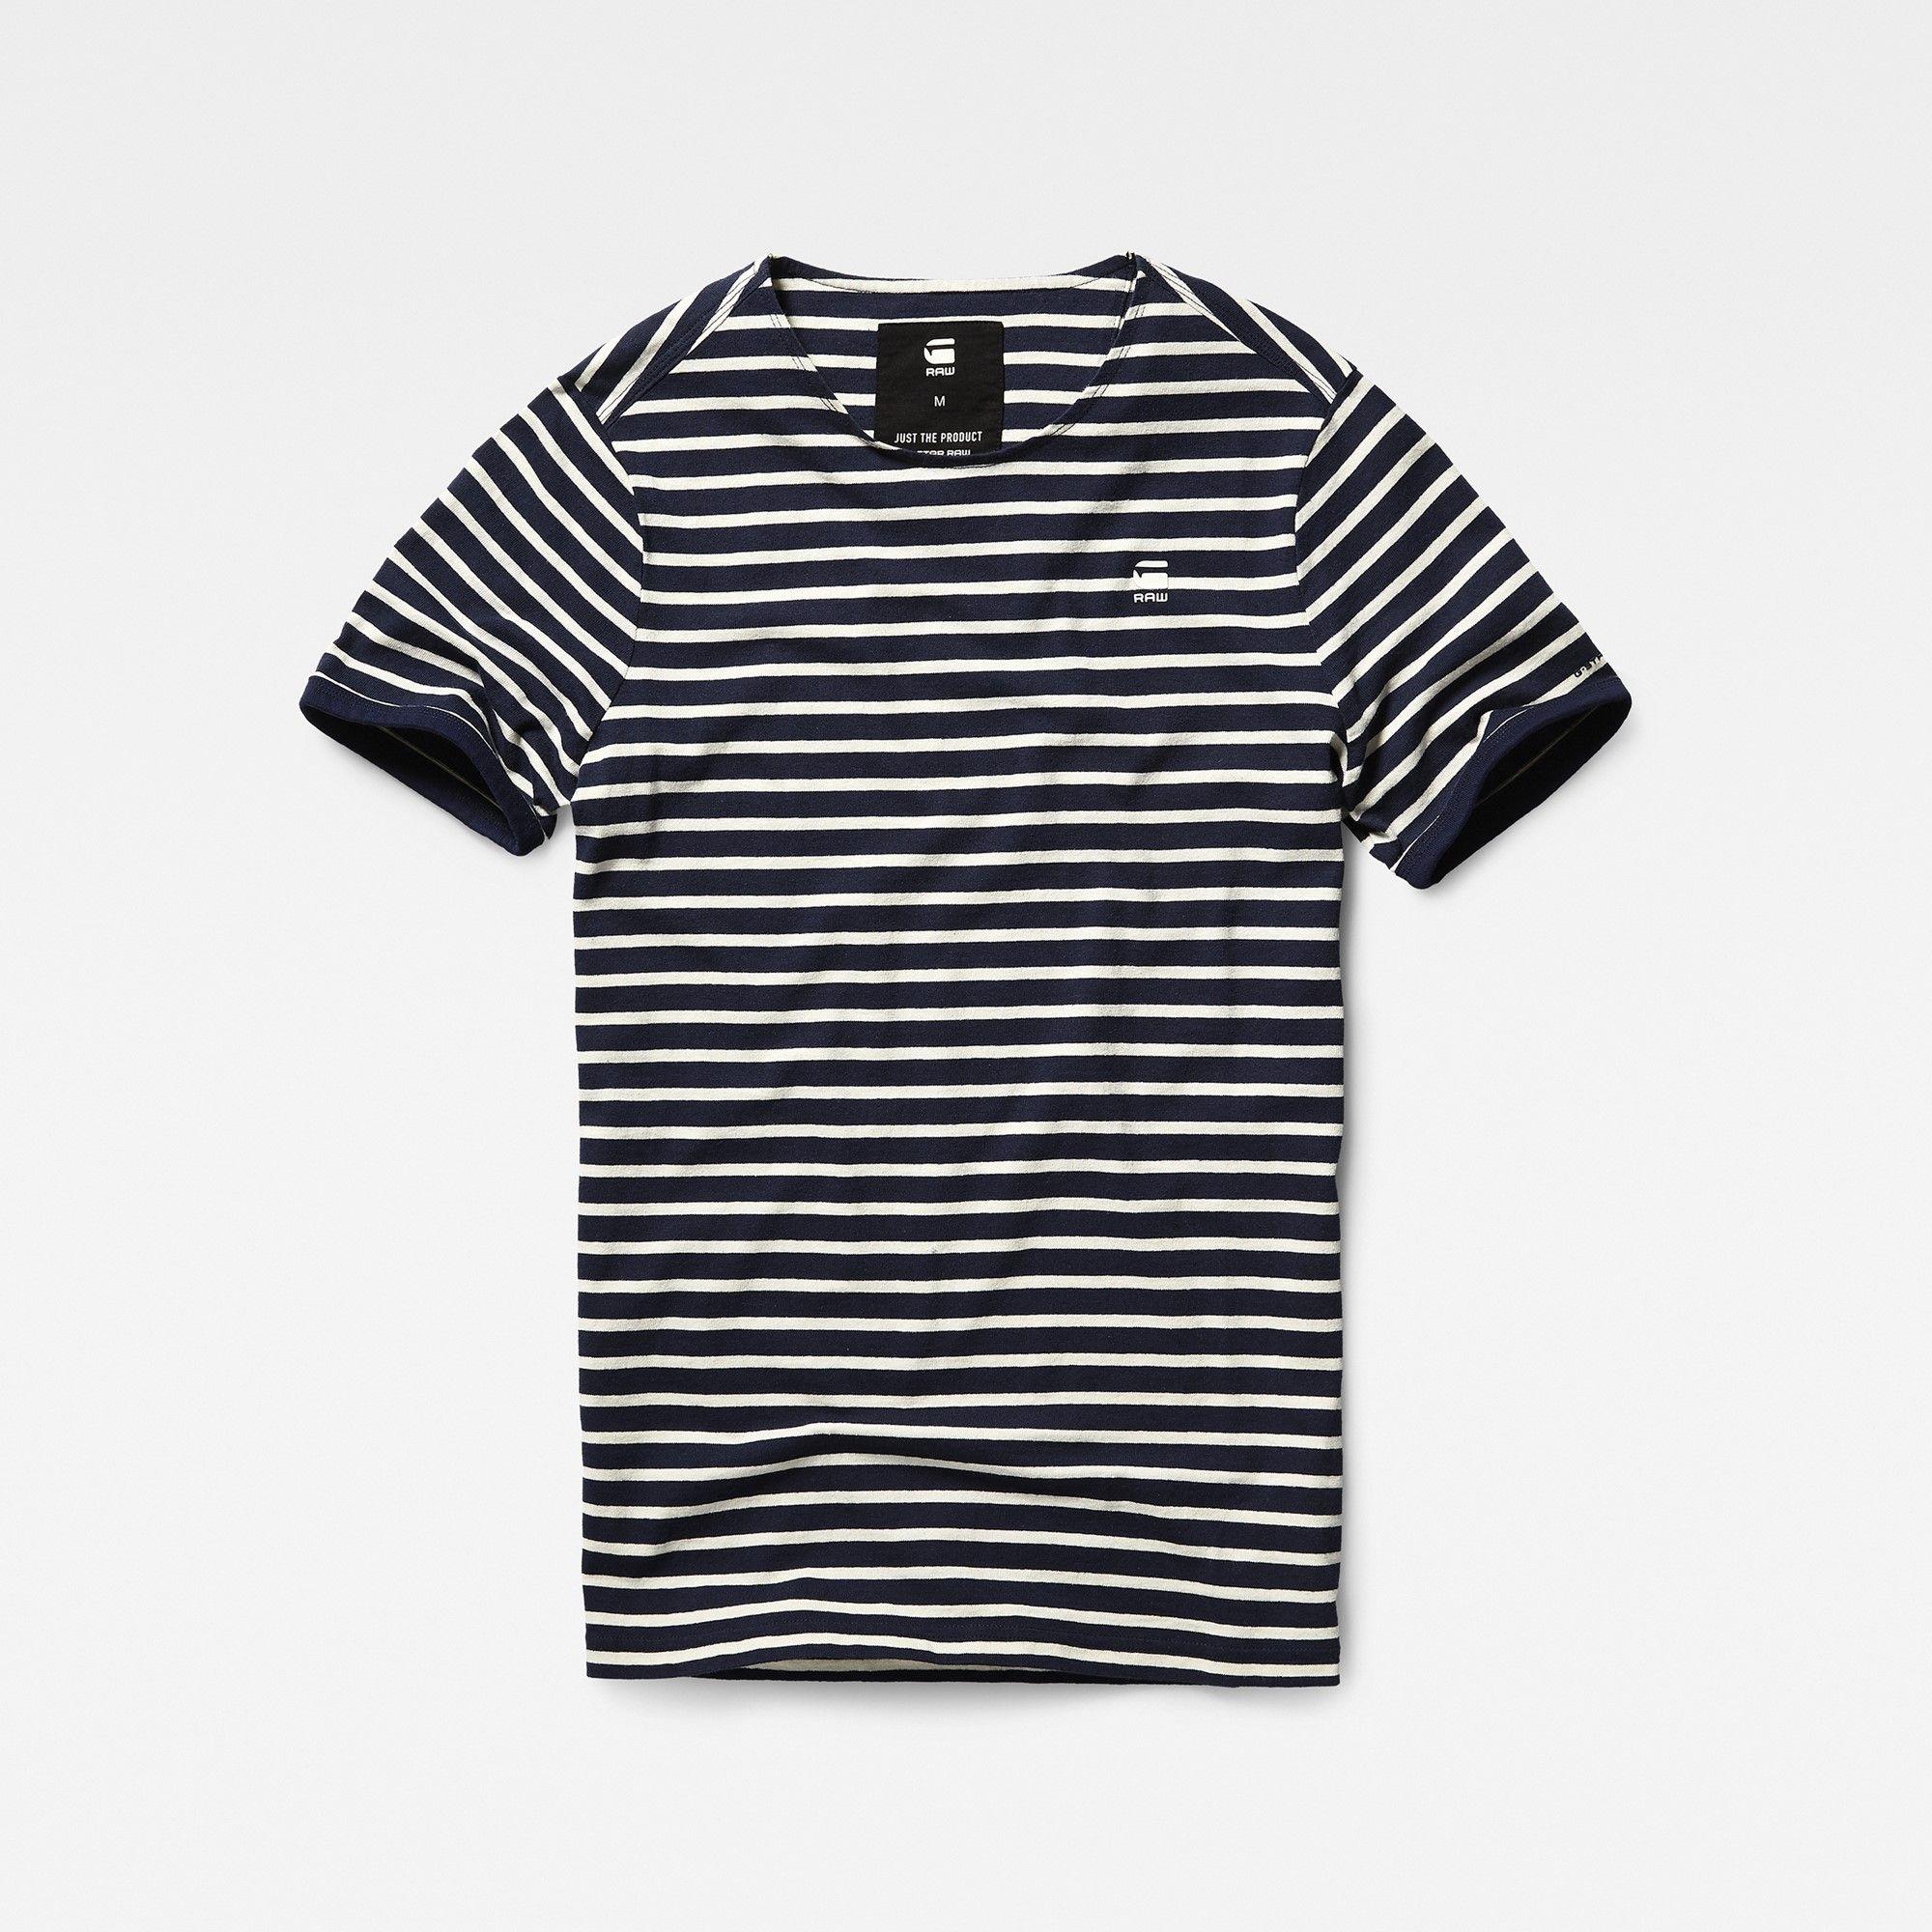 2483765e65 Prebase T-shirt in 2019 | Fashion | G star raw jeans, Mens fashion ...